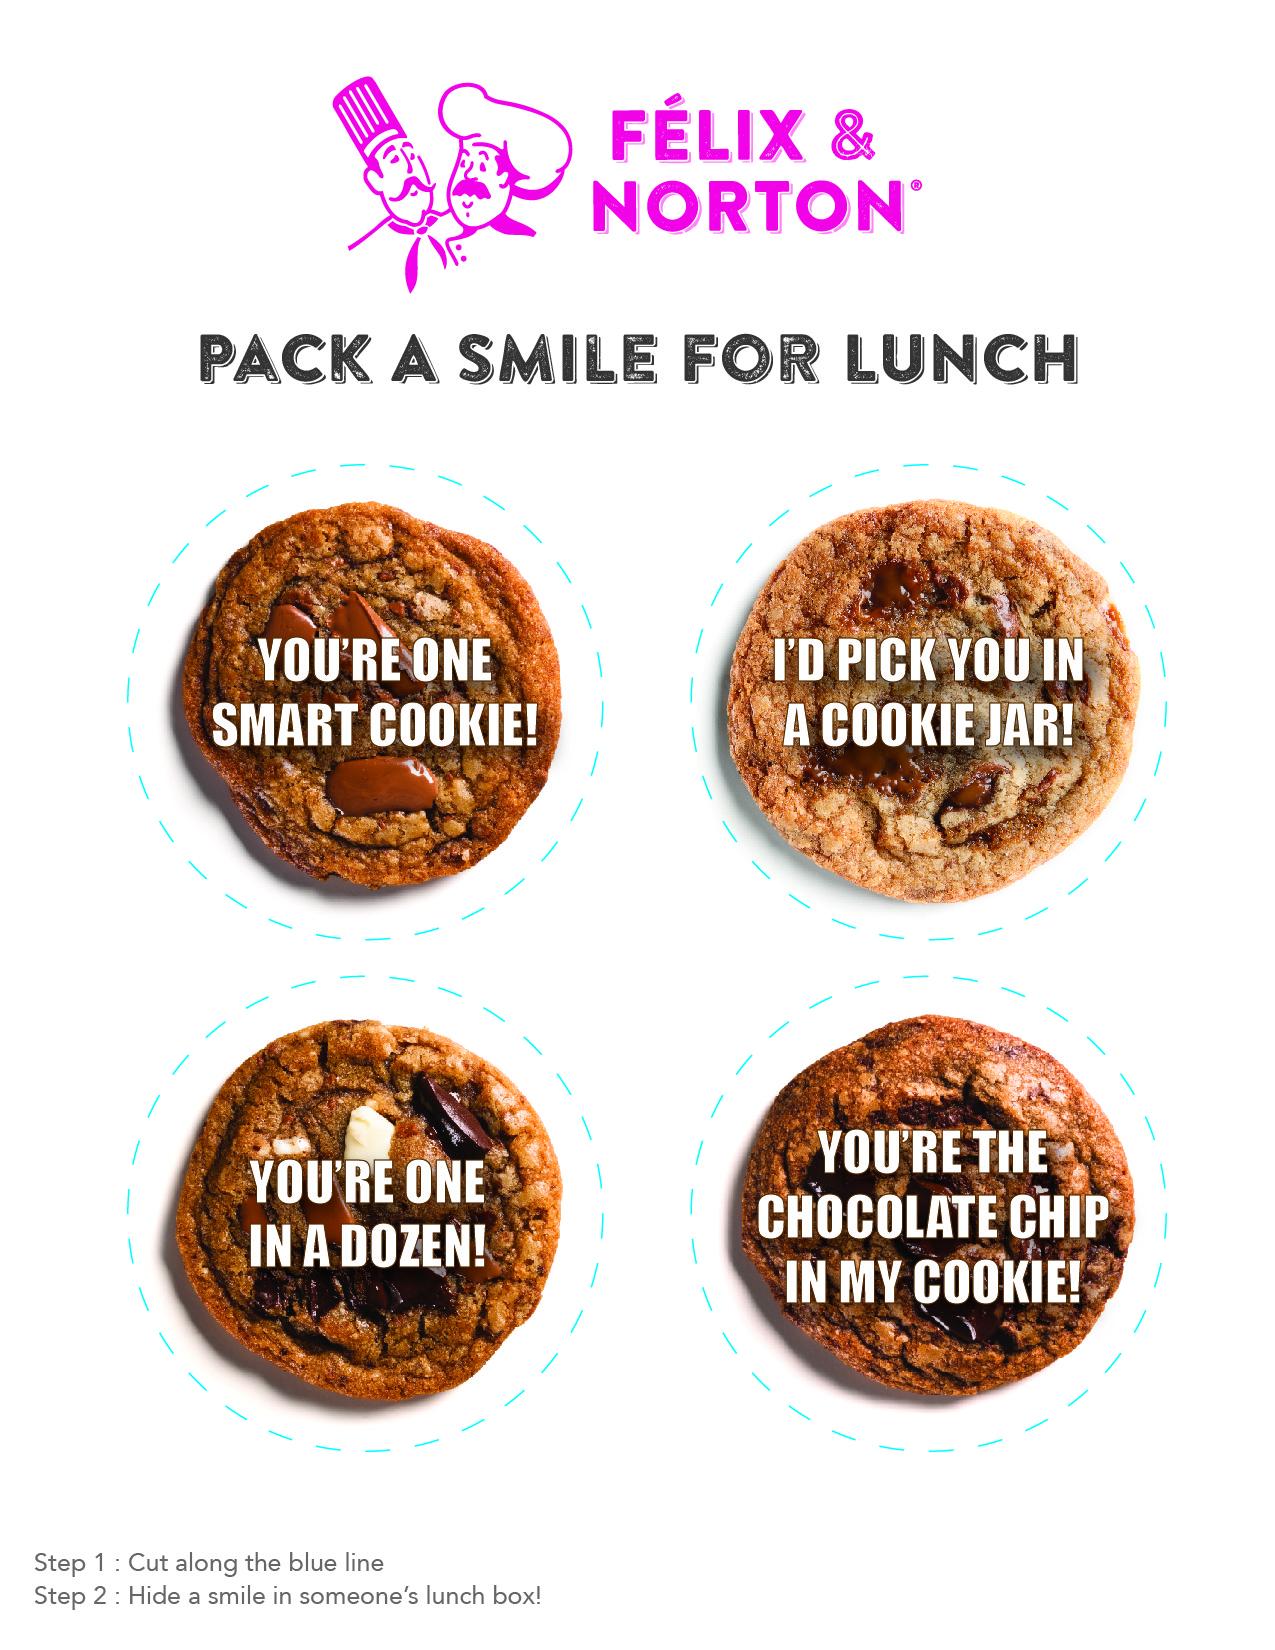 lunch box love notes cookie puns felix & norton